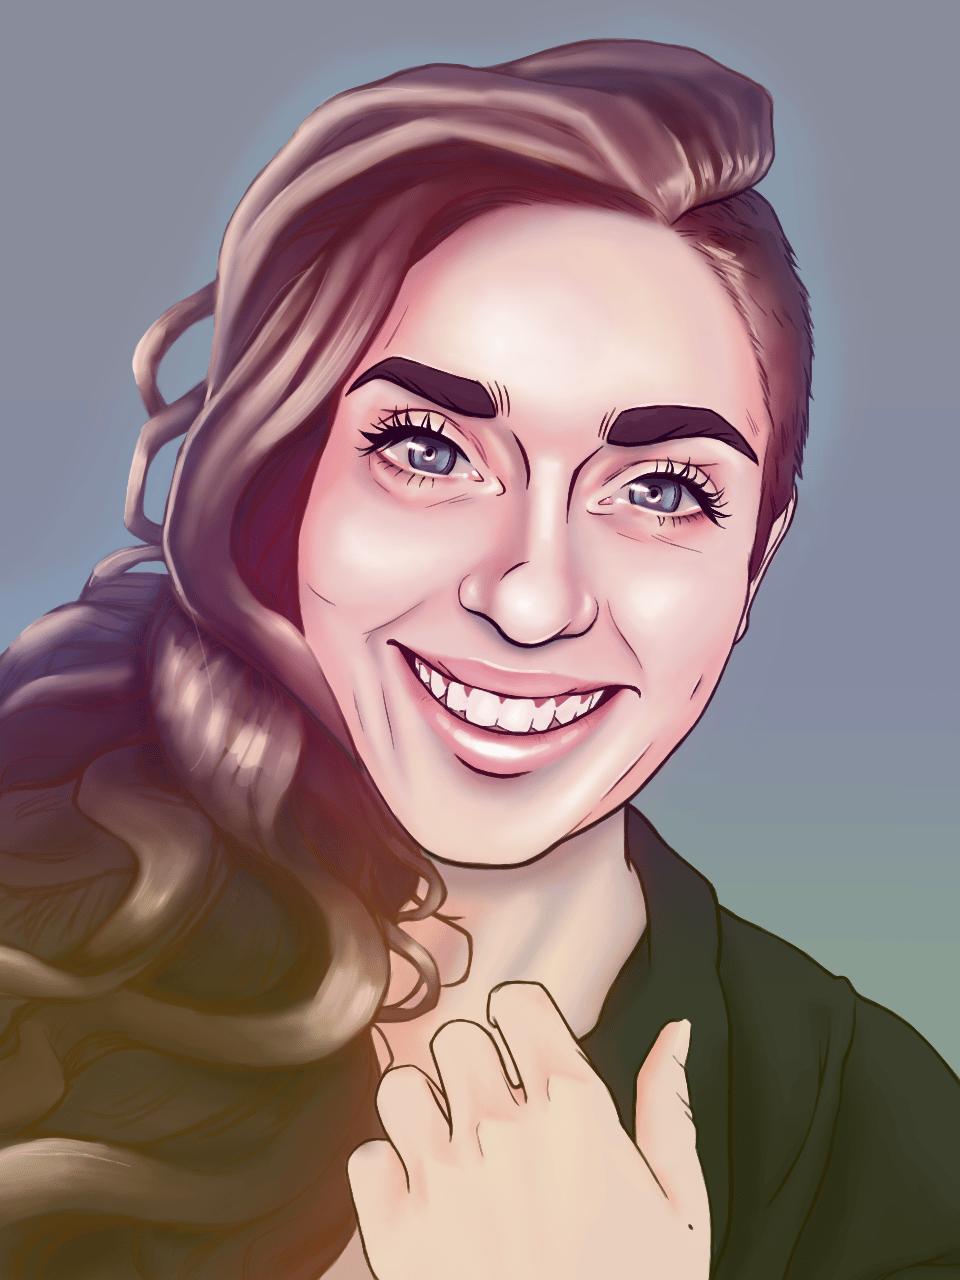 Stylised Portrait - image 1 - student project